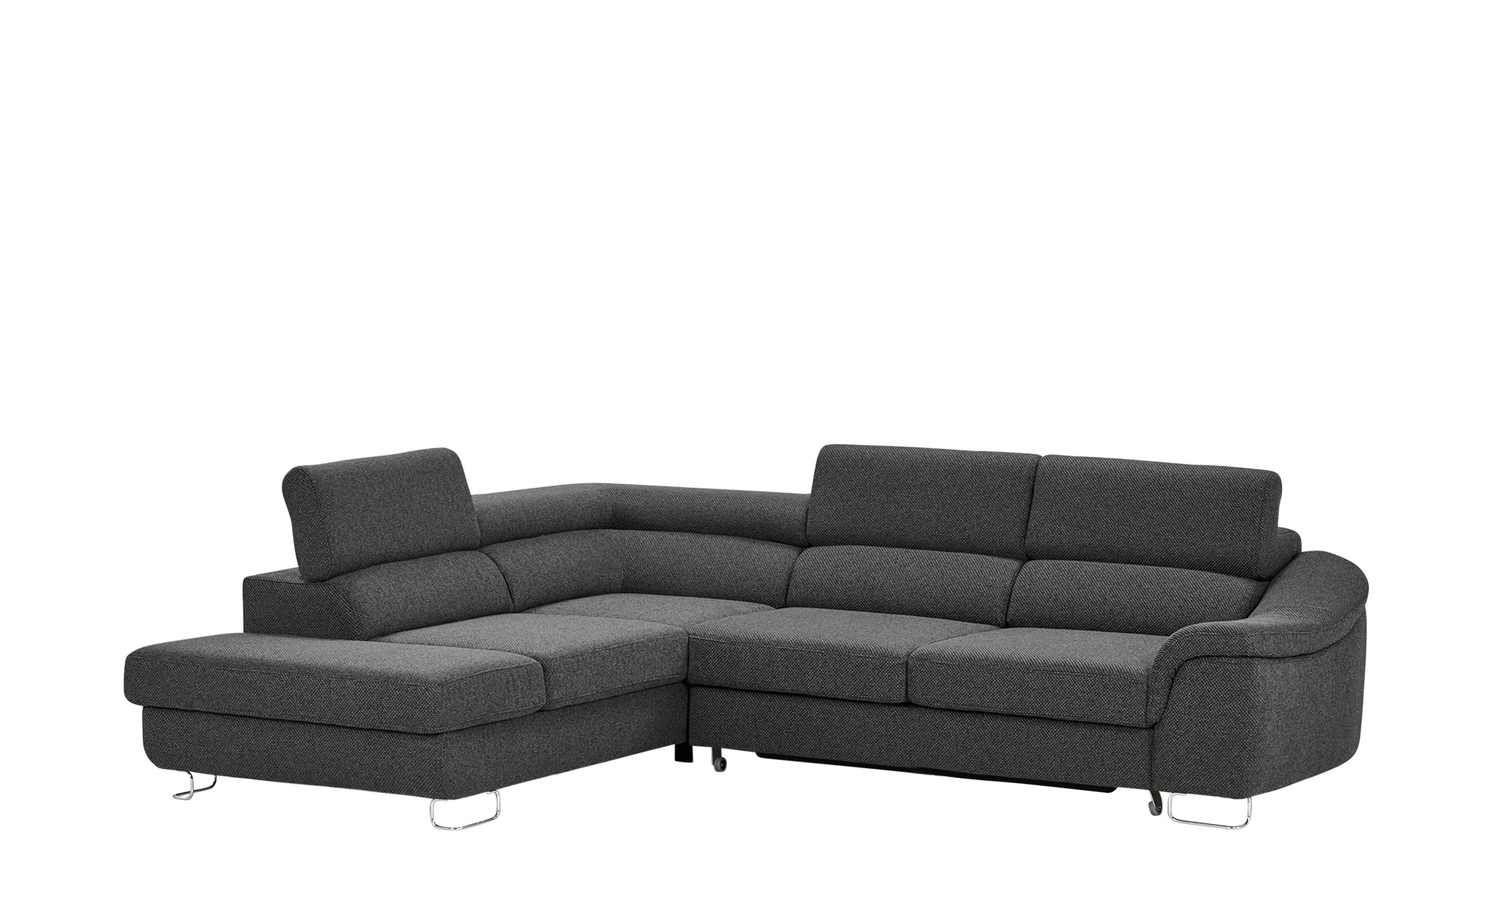 Switch Ecksofa Lavos Gefunden Bei Mobel Kraft Ecksofa Sofa